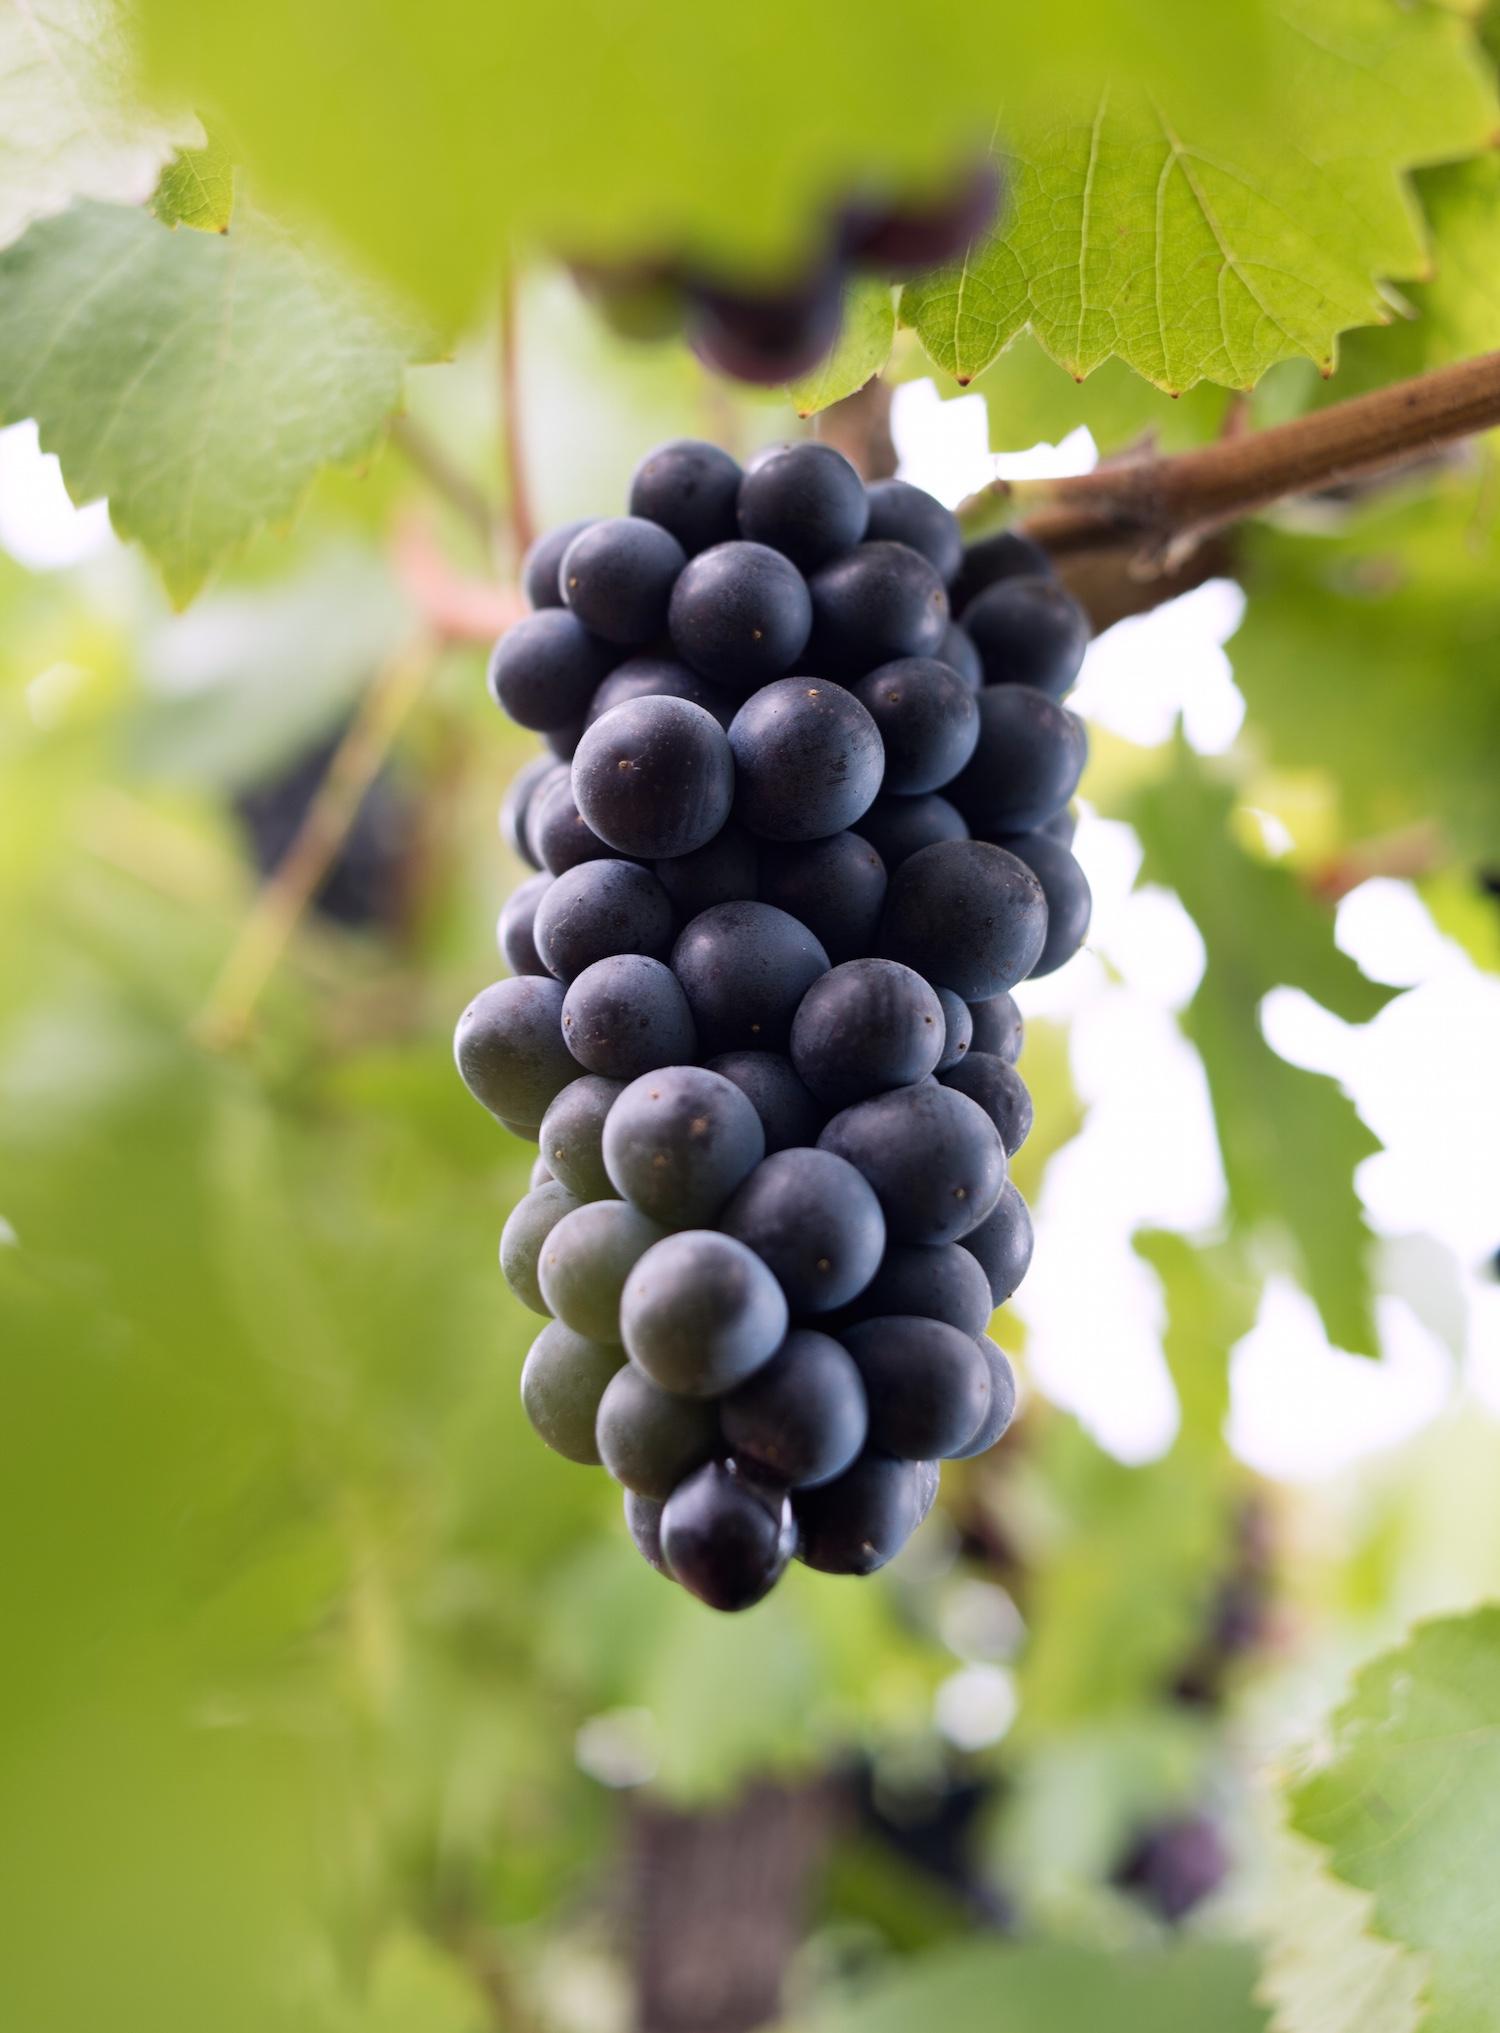 gali-vineyards-grapes6.jpg